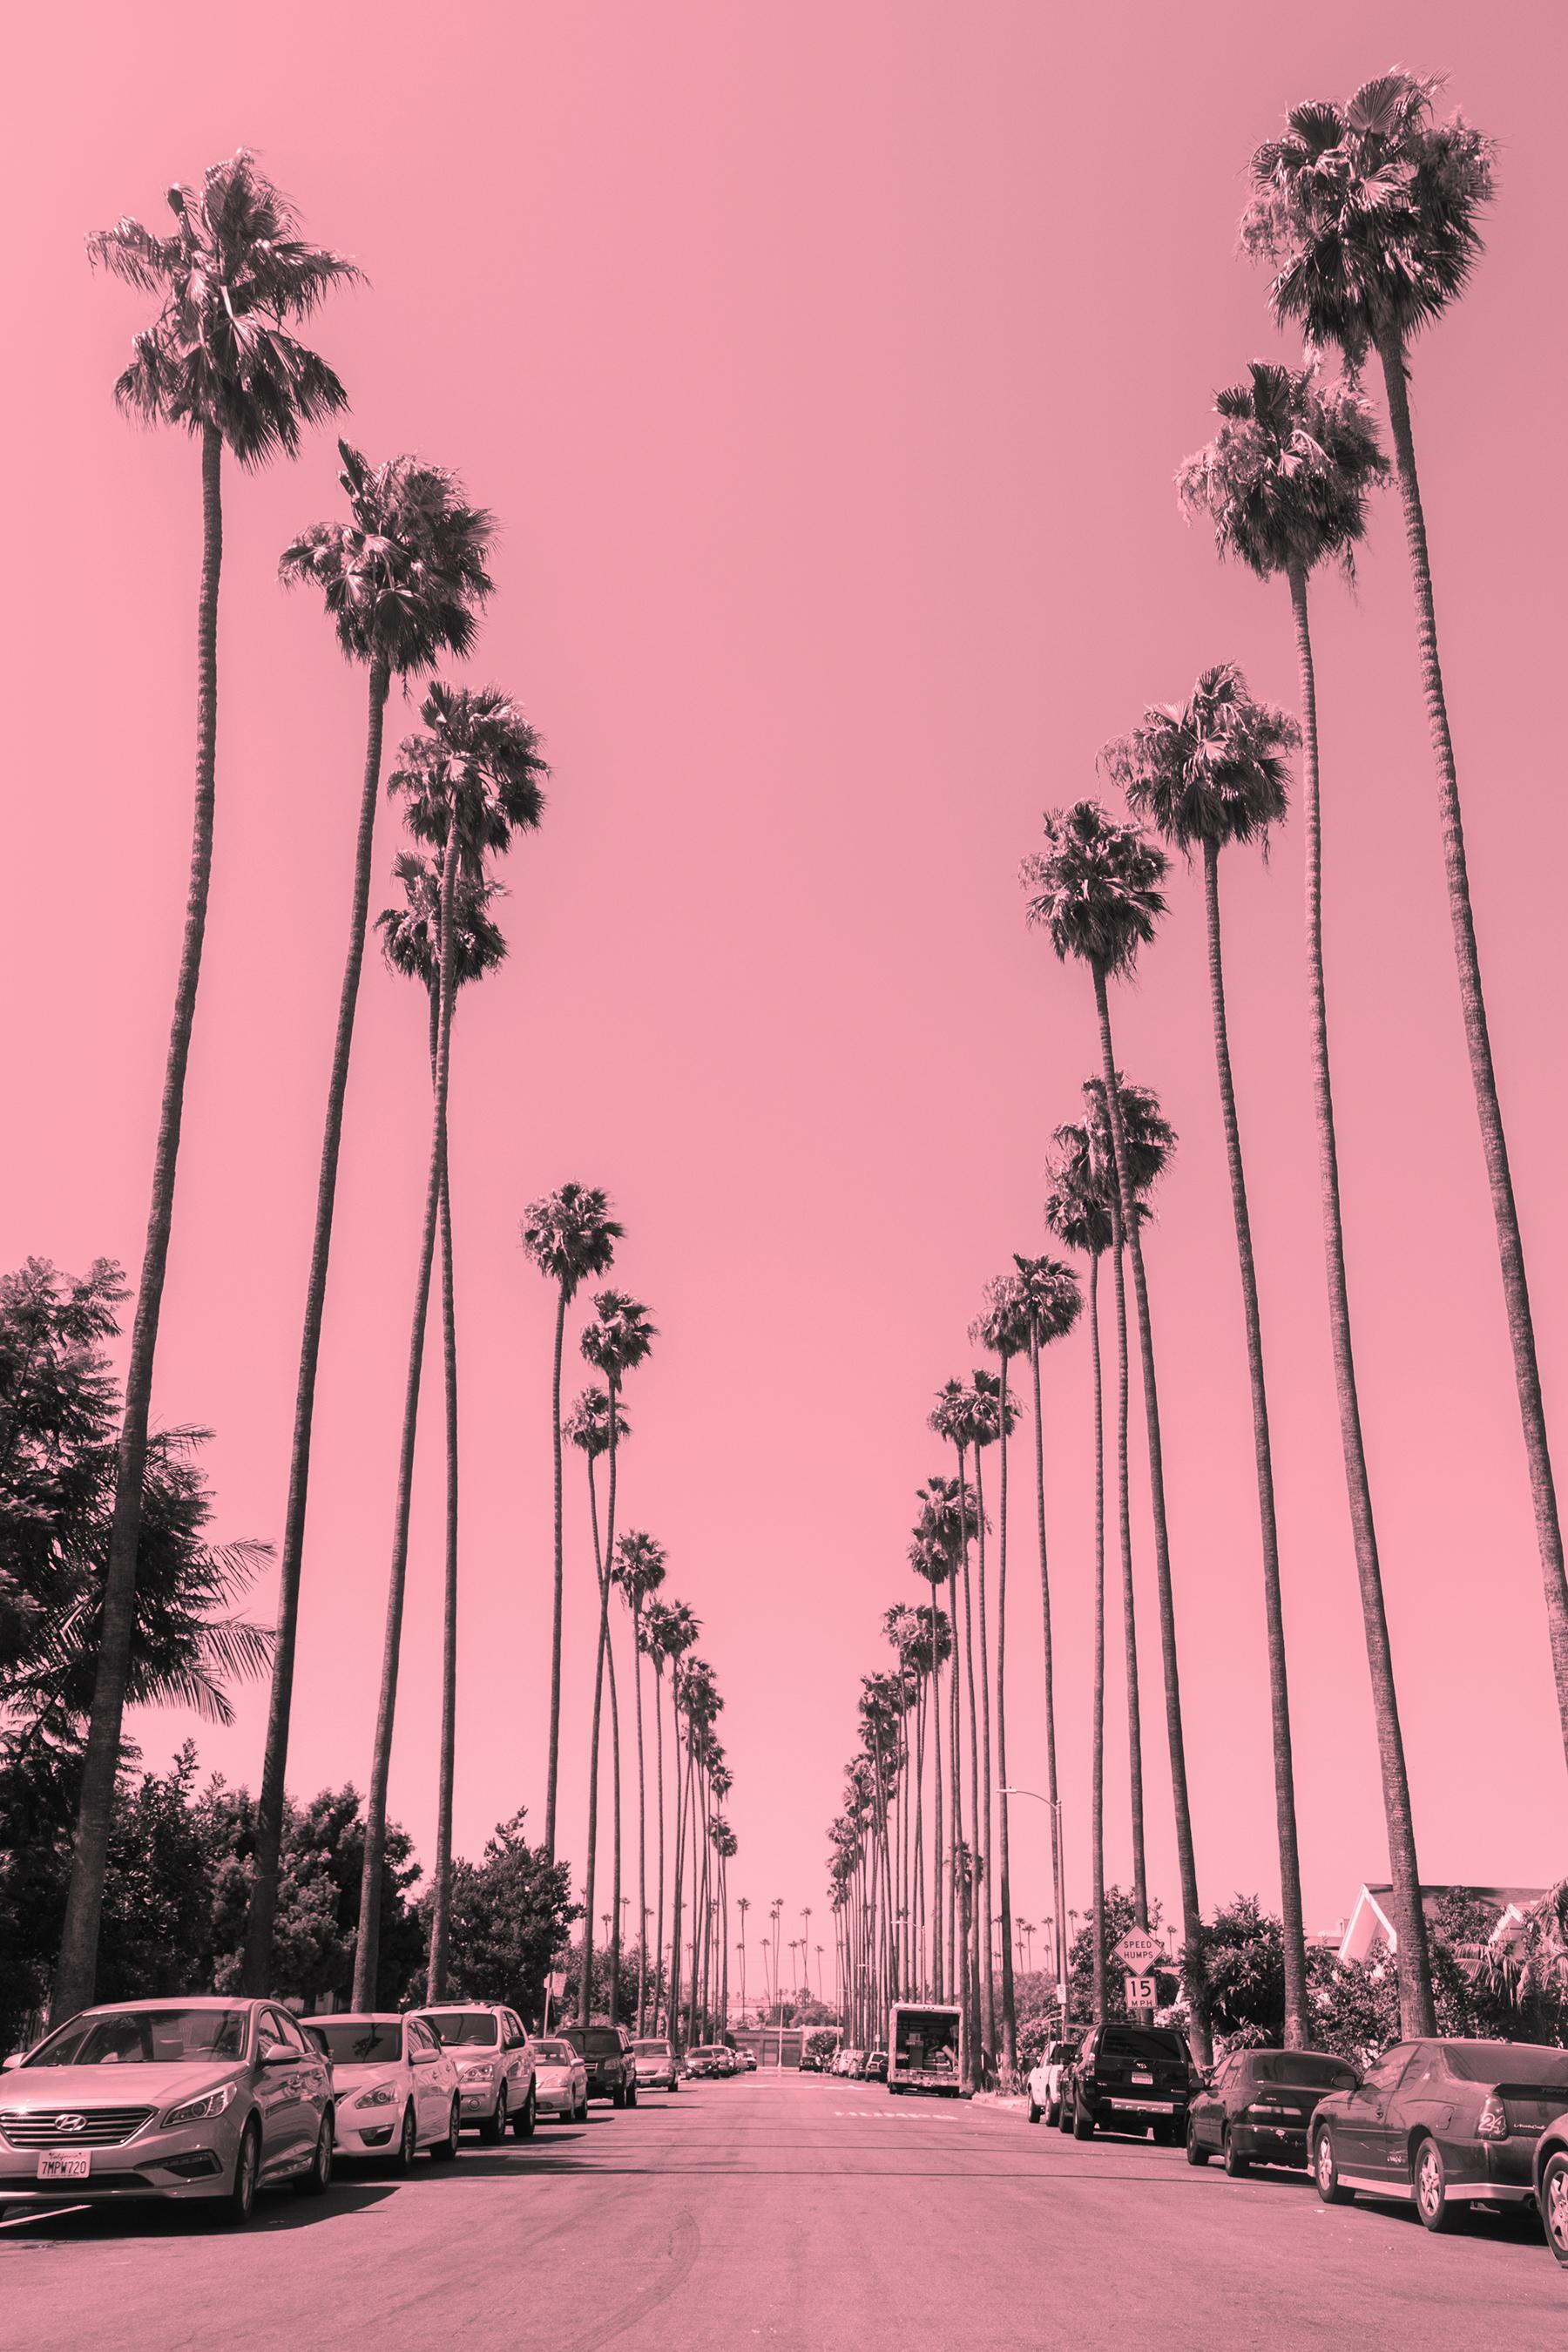 palm trees 1A smaller.jpg